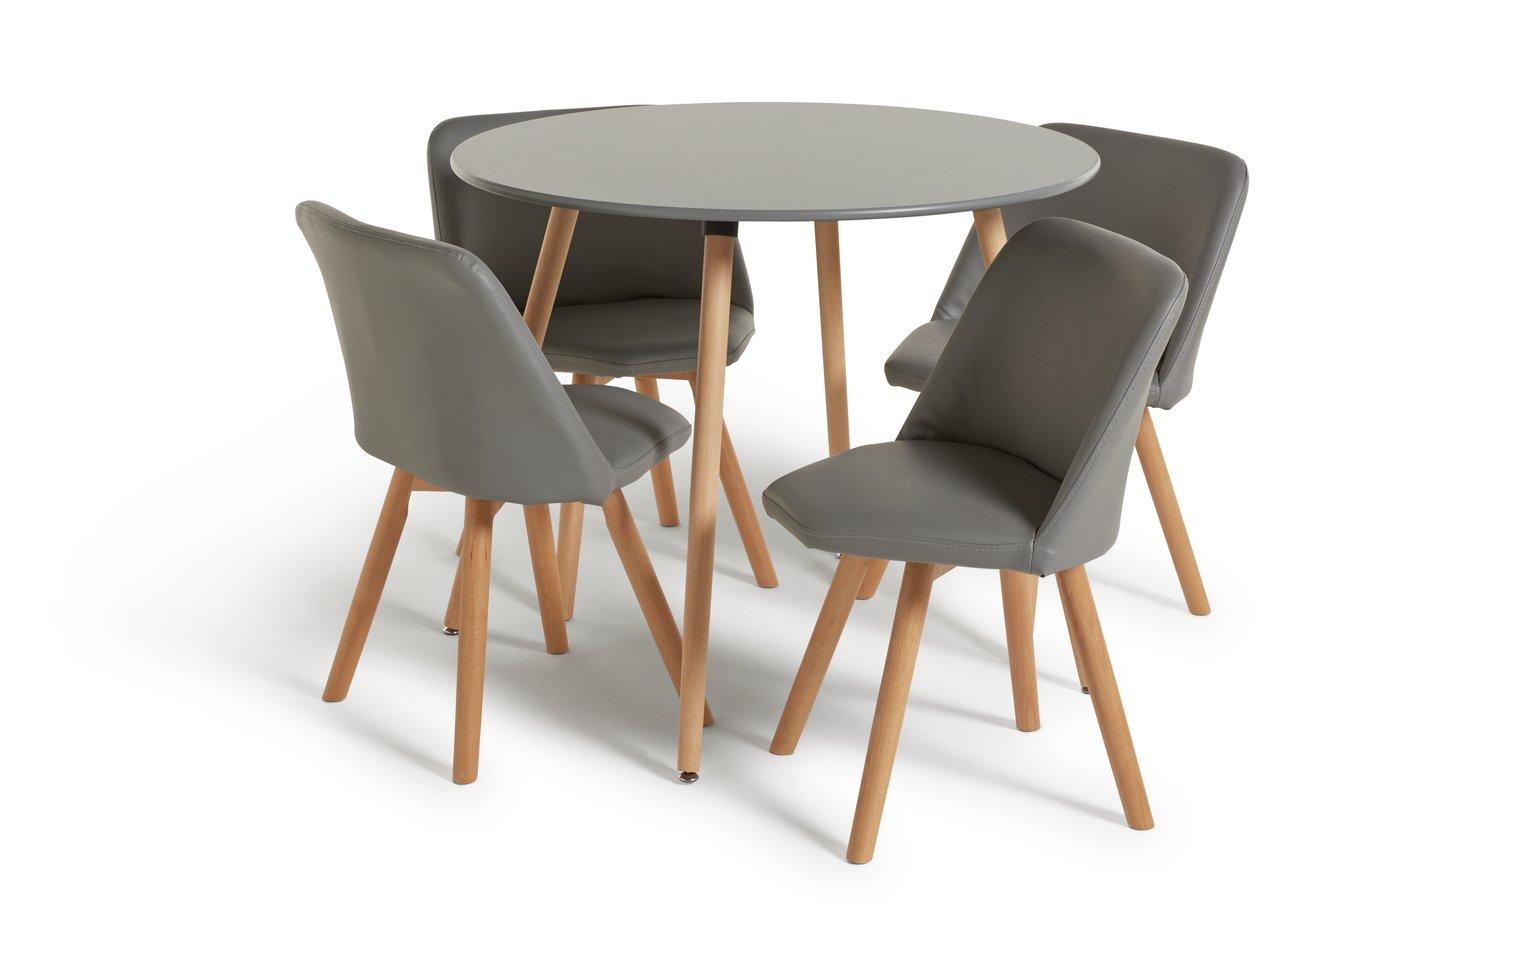 Buy Argos Home Quattro Round Table U0026 4 Chairs   Grey | Space Saving Dining  Sets | Argos